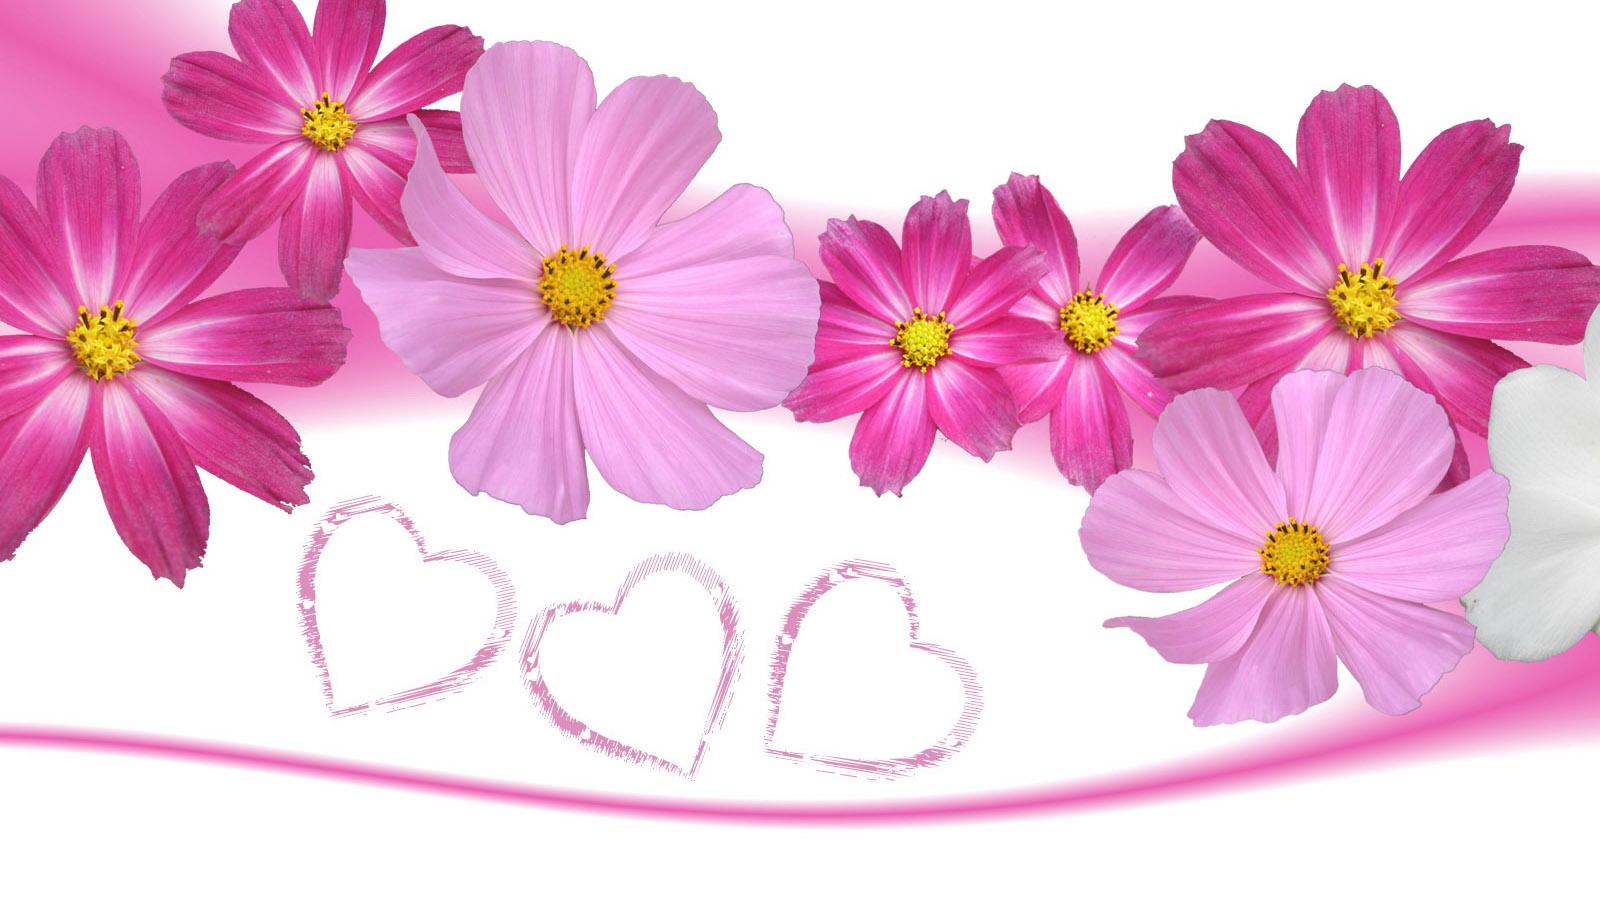 Pink Flower Background Hd Flowers Healthy